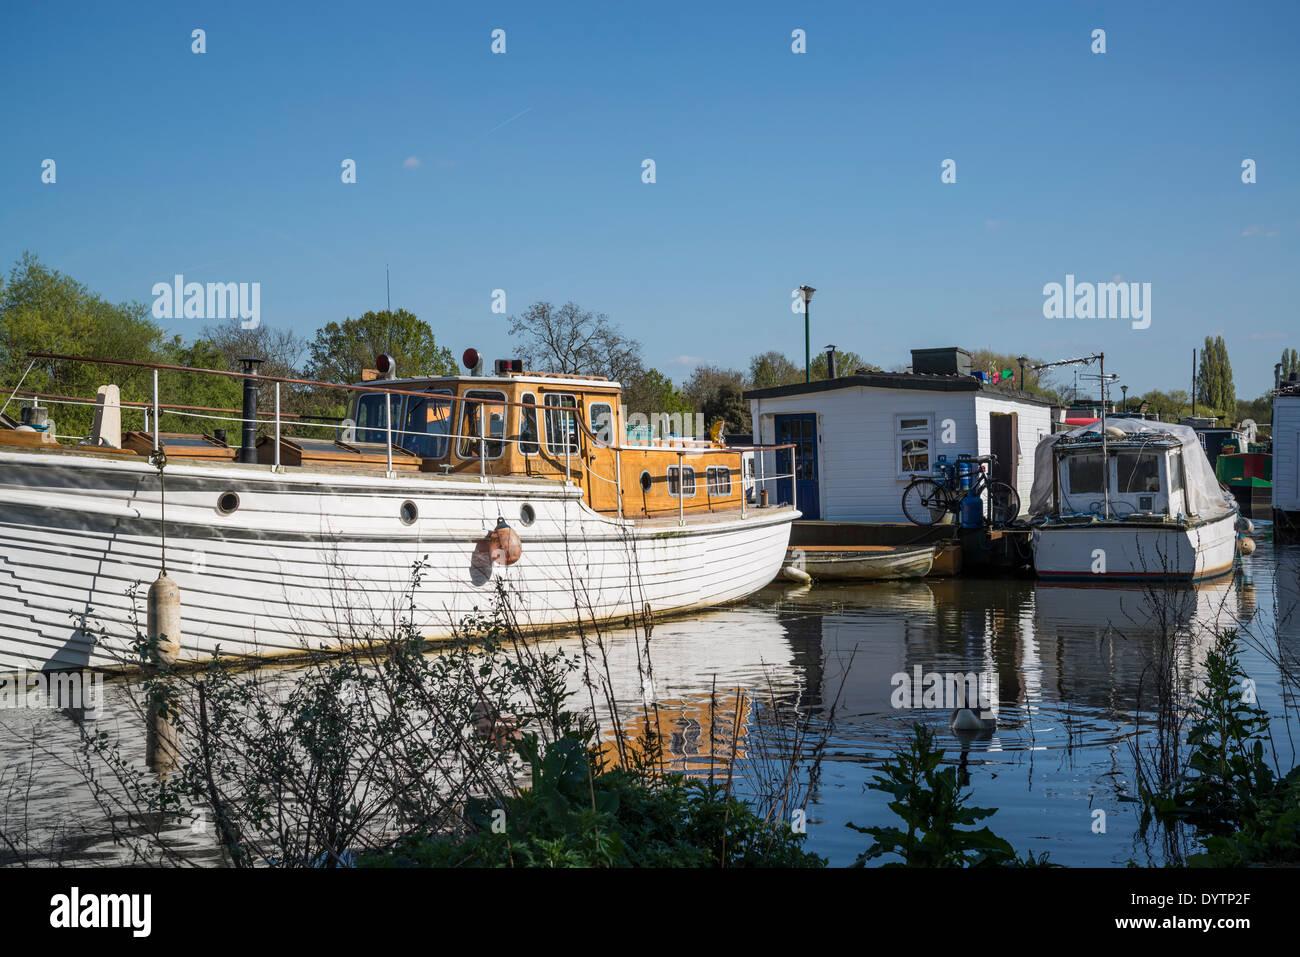 Boatyard on the river Thames, Borough of Richmond, London, UK Stock Photo